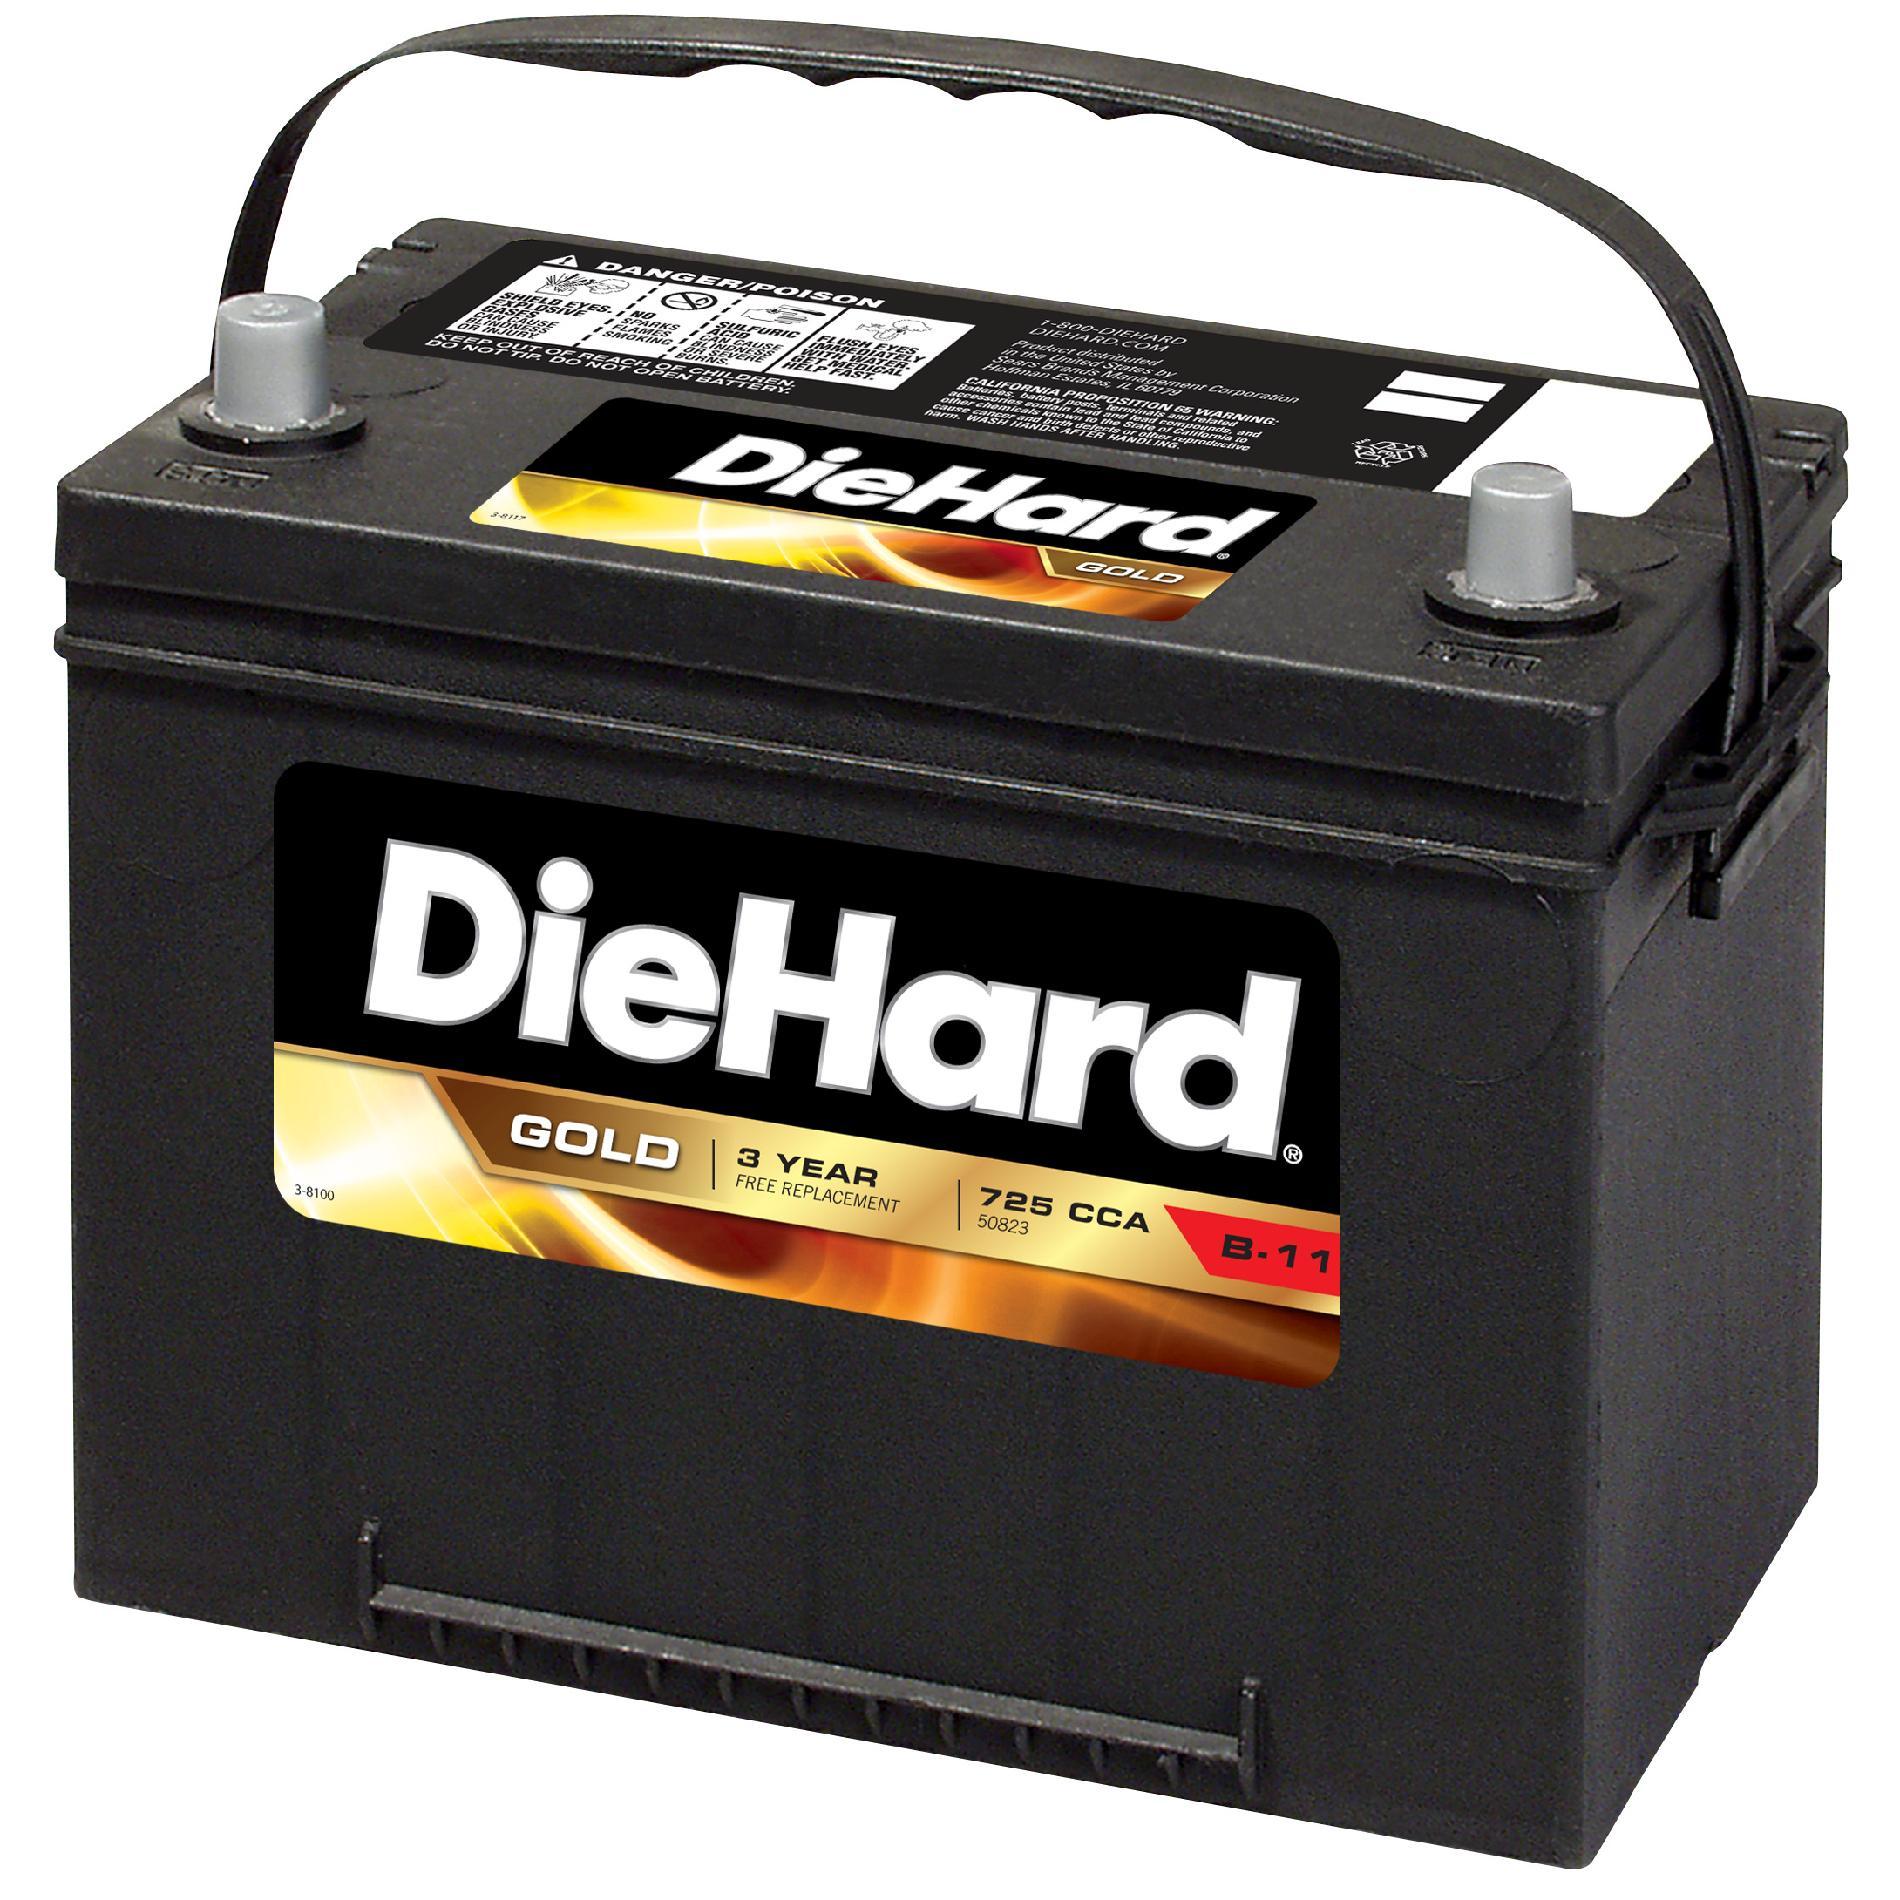 SEARS - 25% OFF all Die Hard Automotive/Marine/Lawn & Garden Batteries + Free in-store pickup